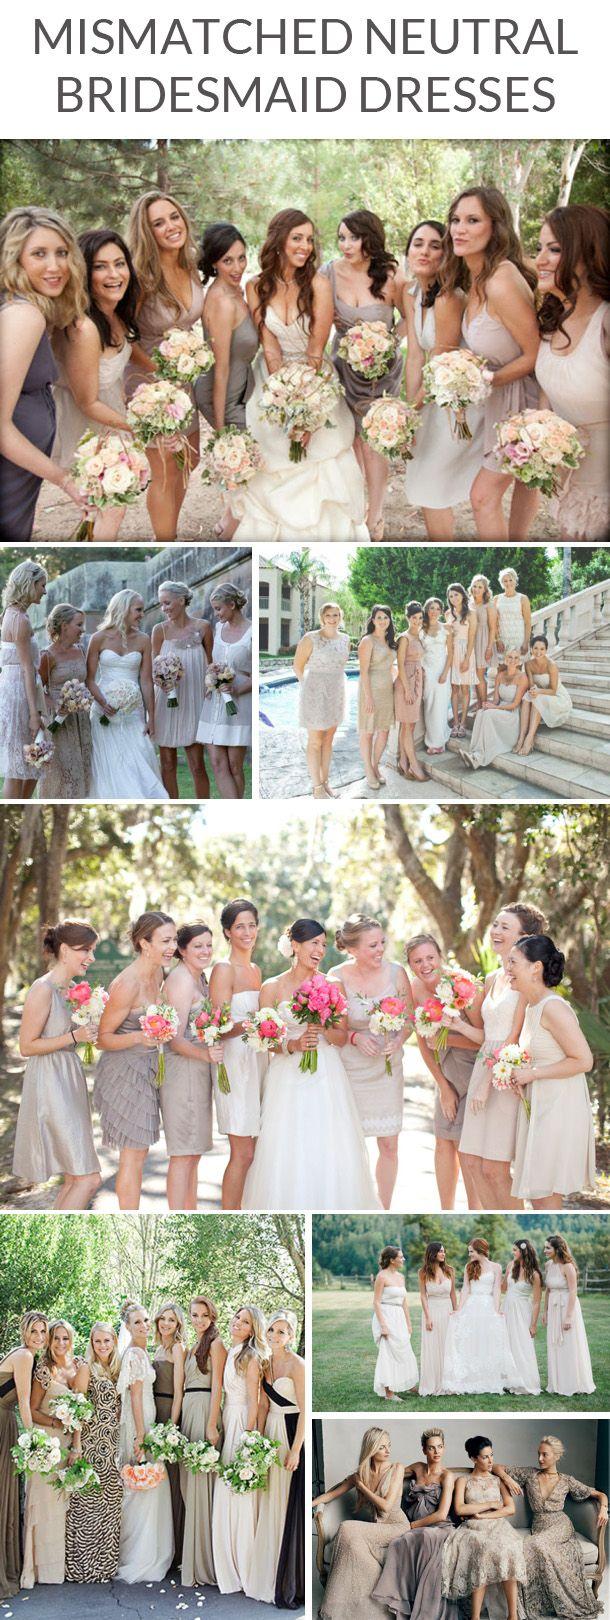 Mismatched neutral bridesmaid dresses | SouthBound Bride www.southboundbride.com/mismatched-neutral-bridesmaid-dresses Full image credits & links on blog post